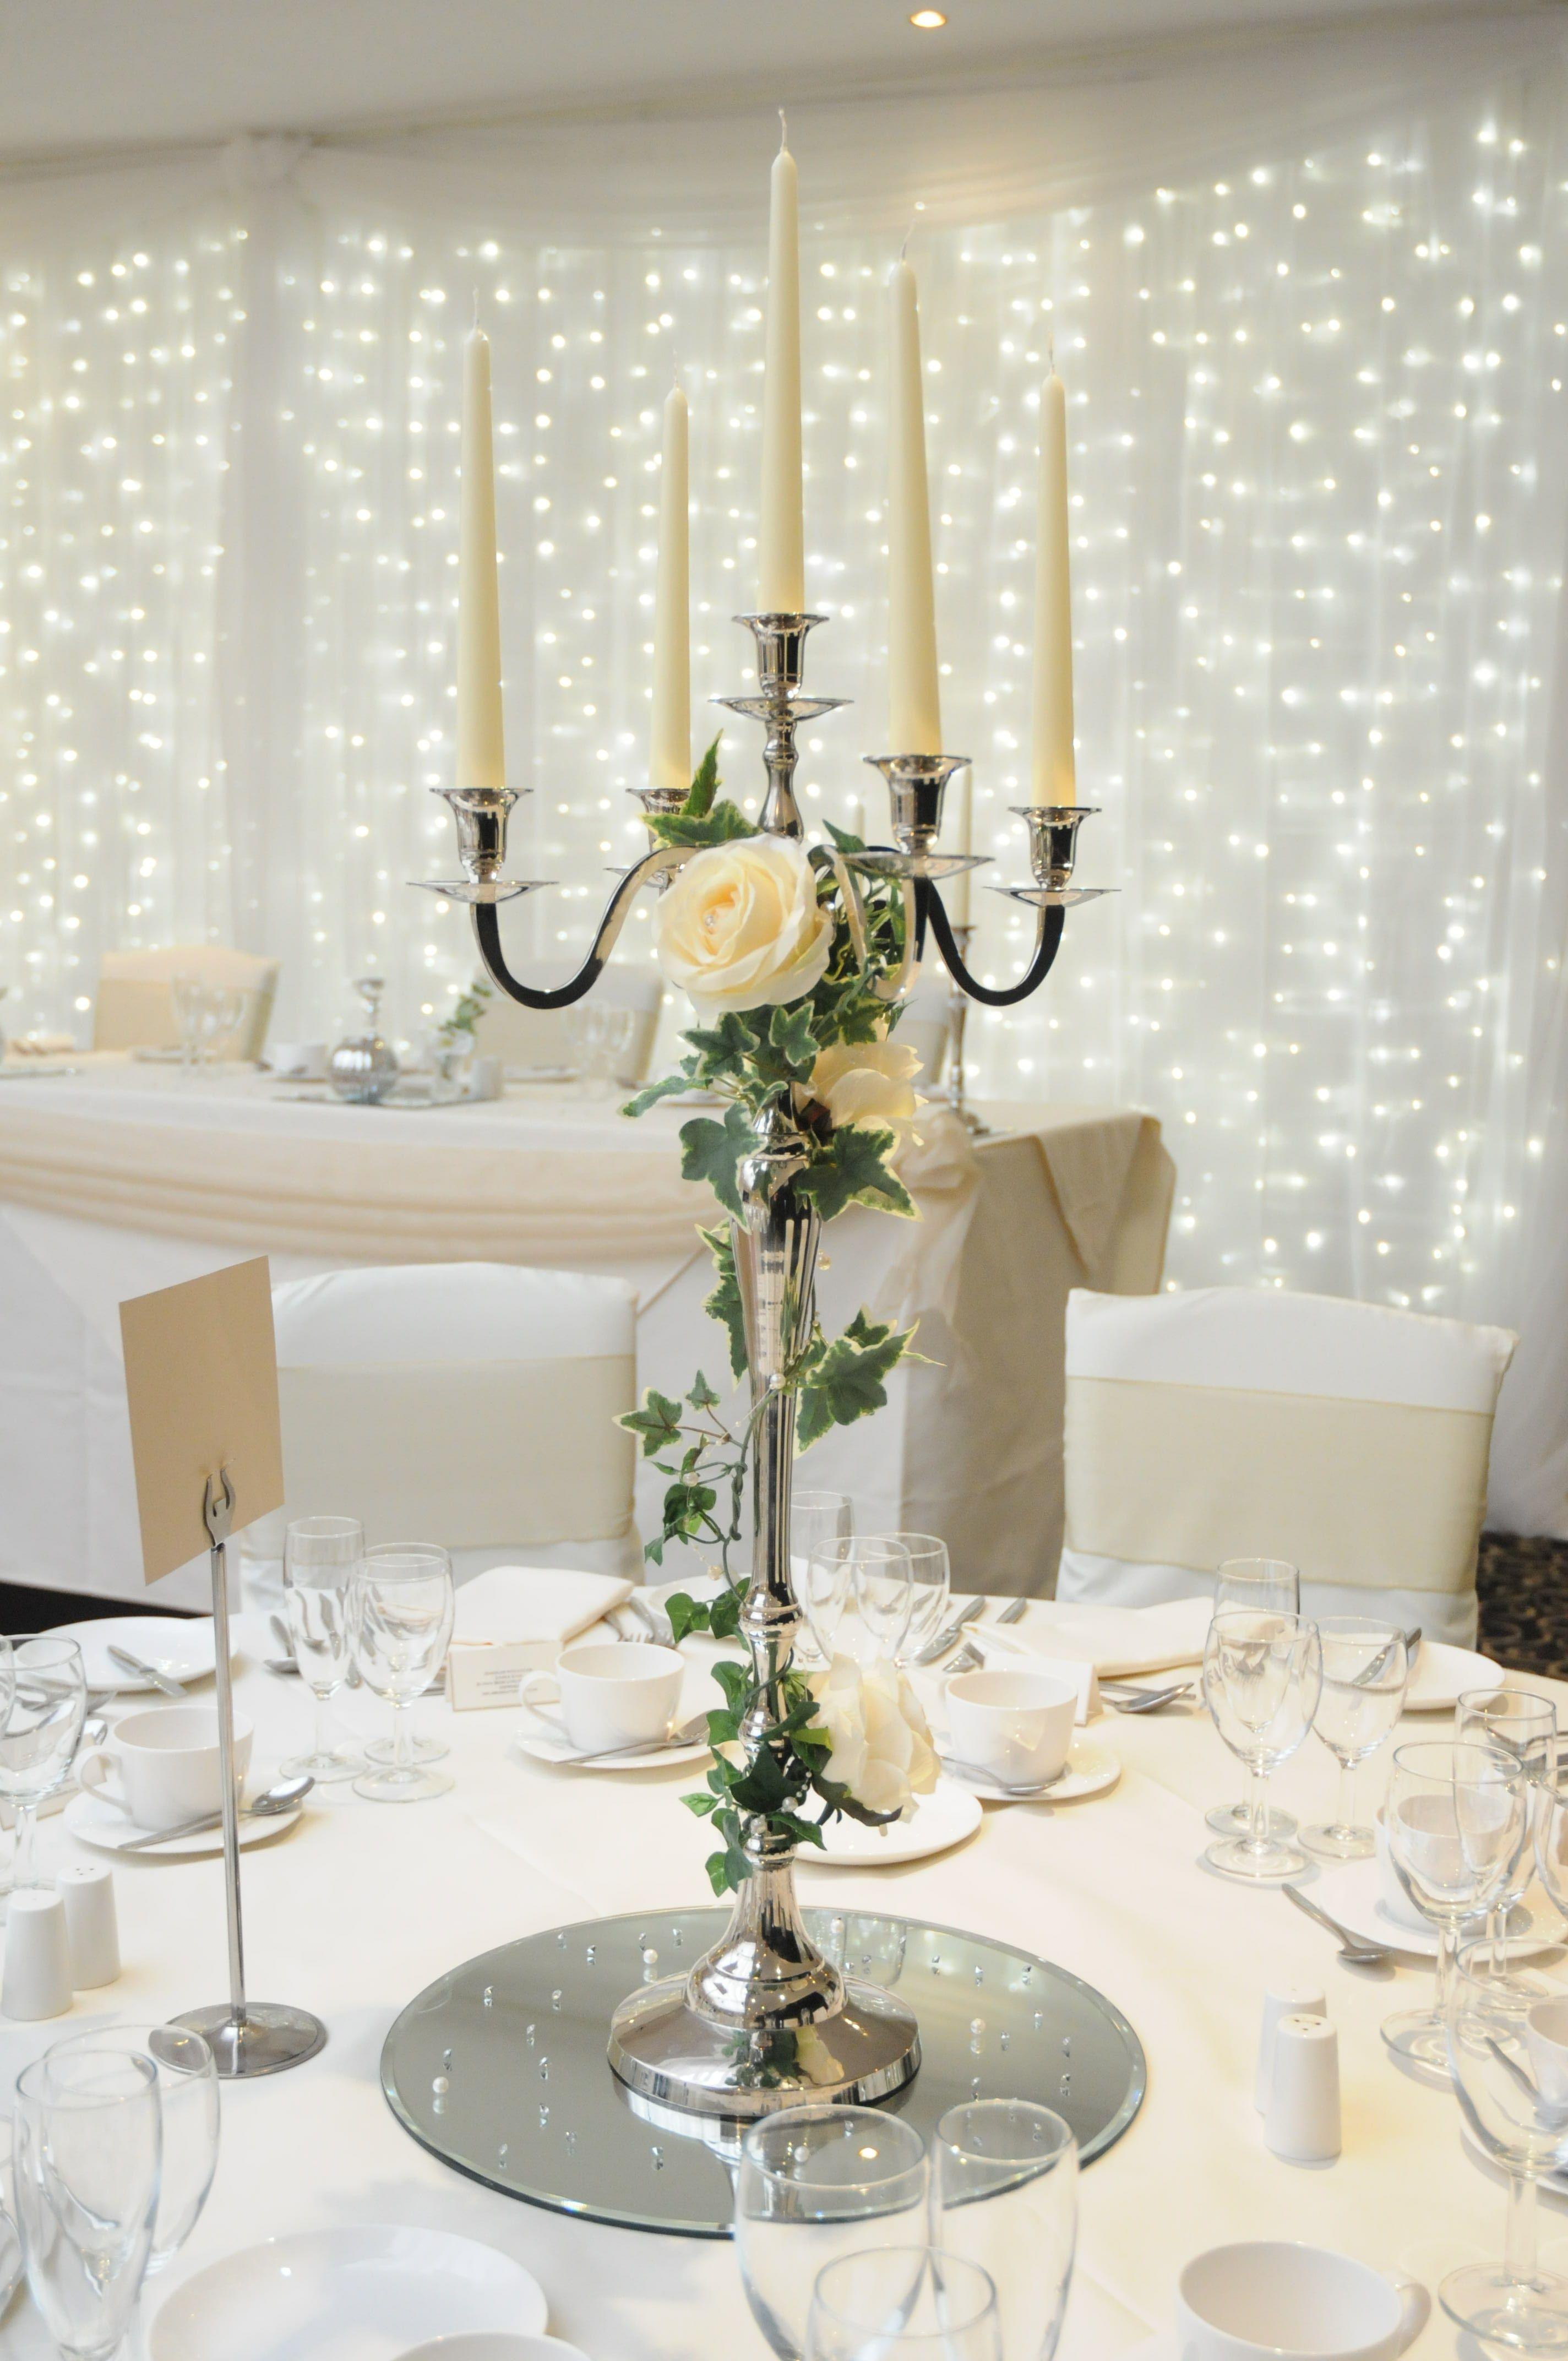 Centrepiece wedding 39 day pinterest centerpieces for Table centrepiece